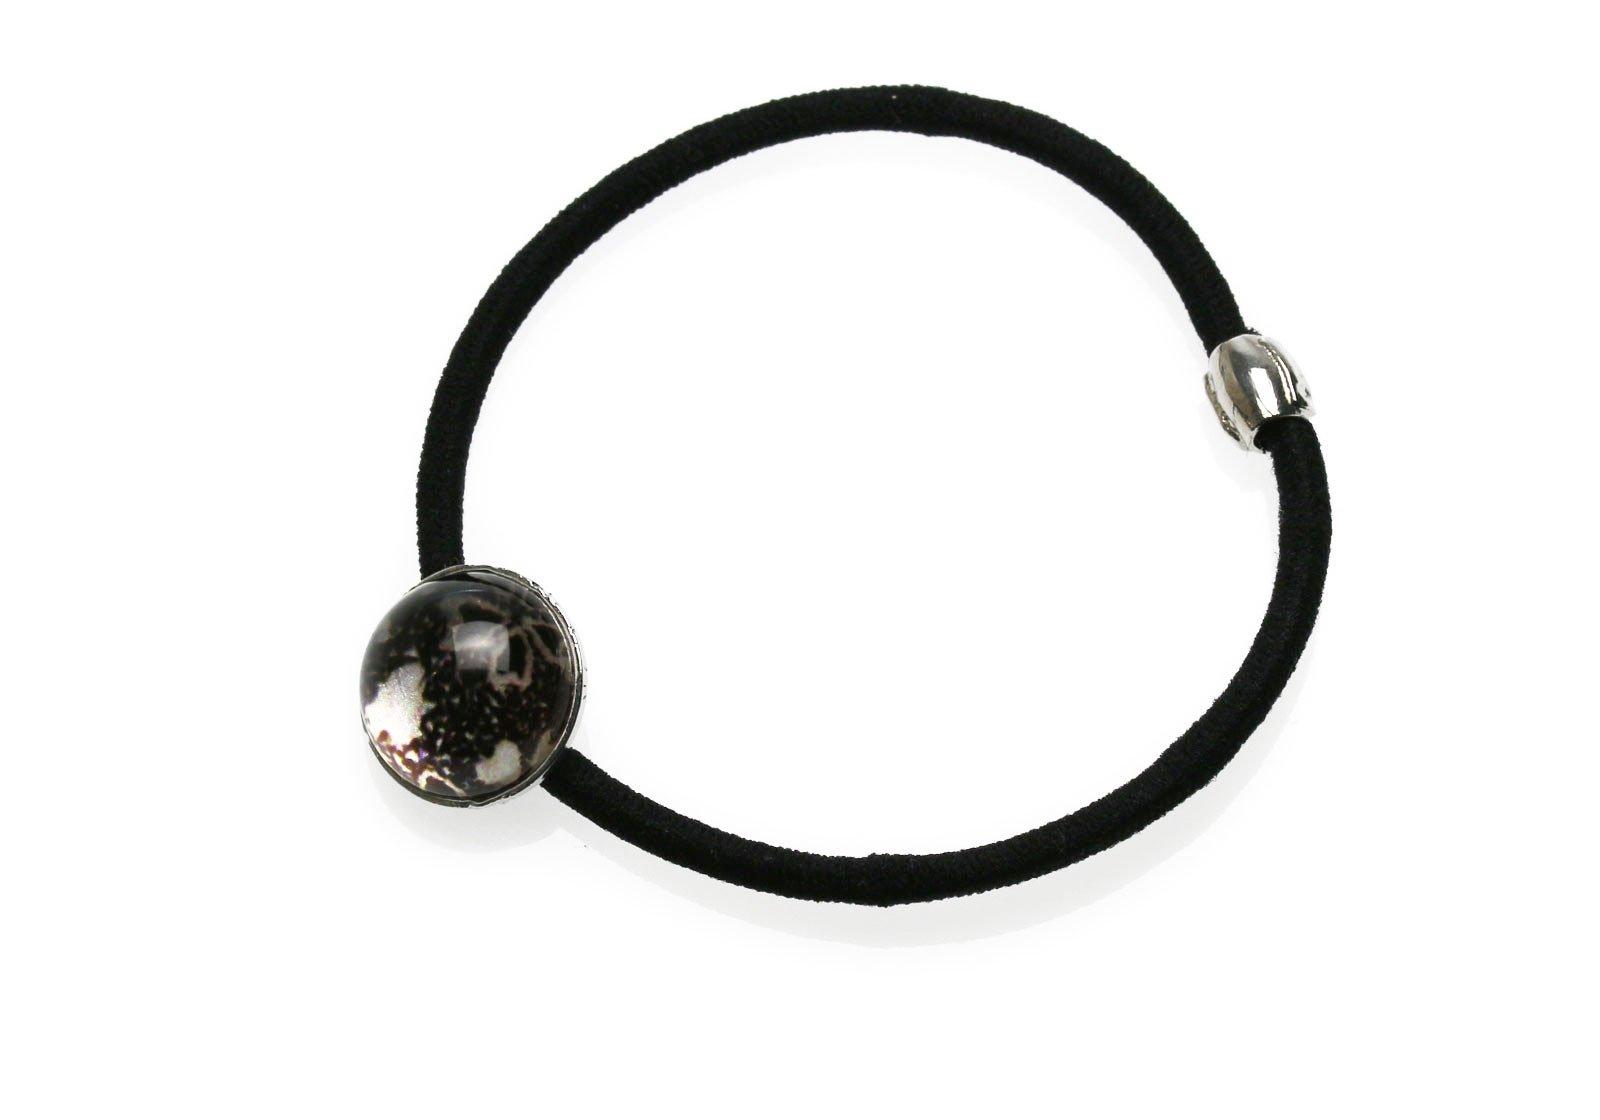 Tamarusan Silver Sakura Round Black Simple Hair Hair Nickel Free Handmade Resin